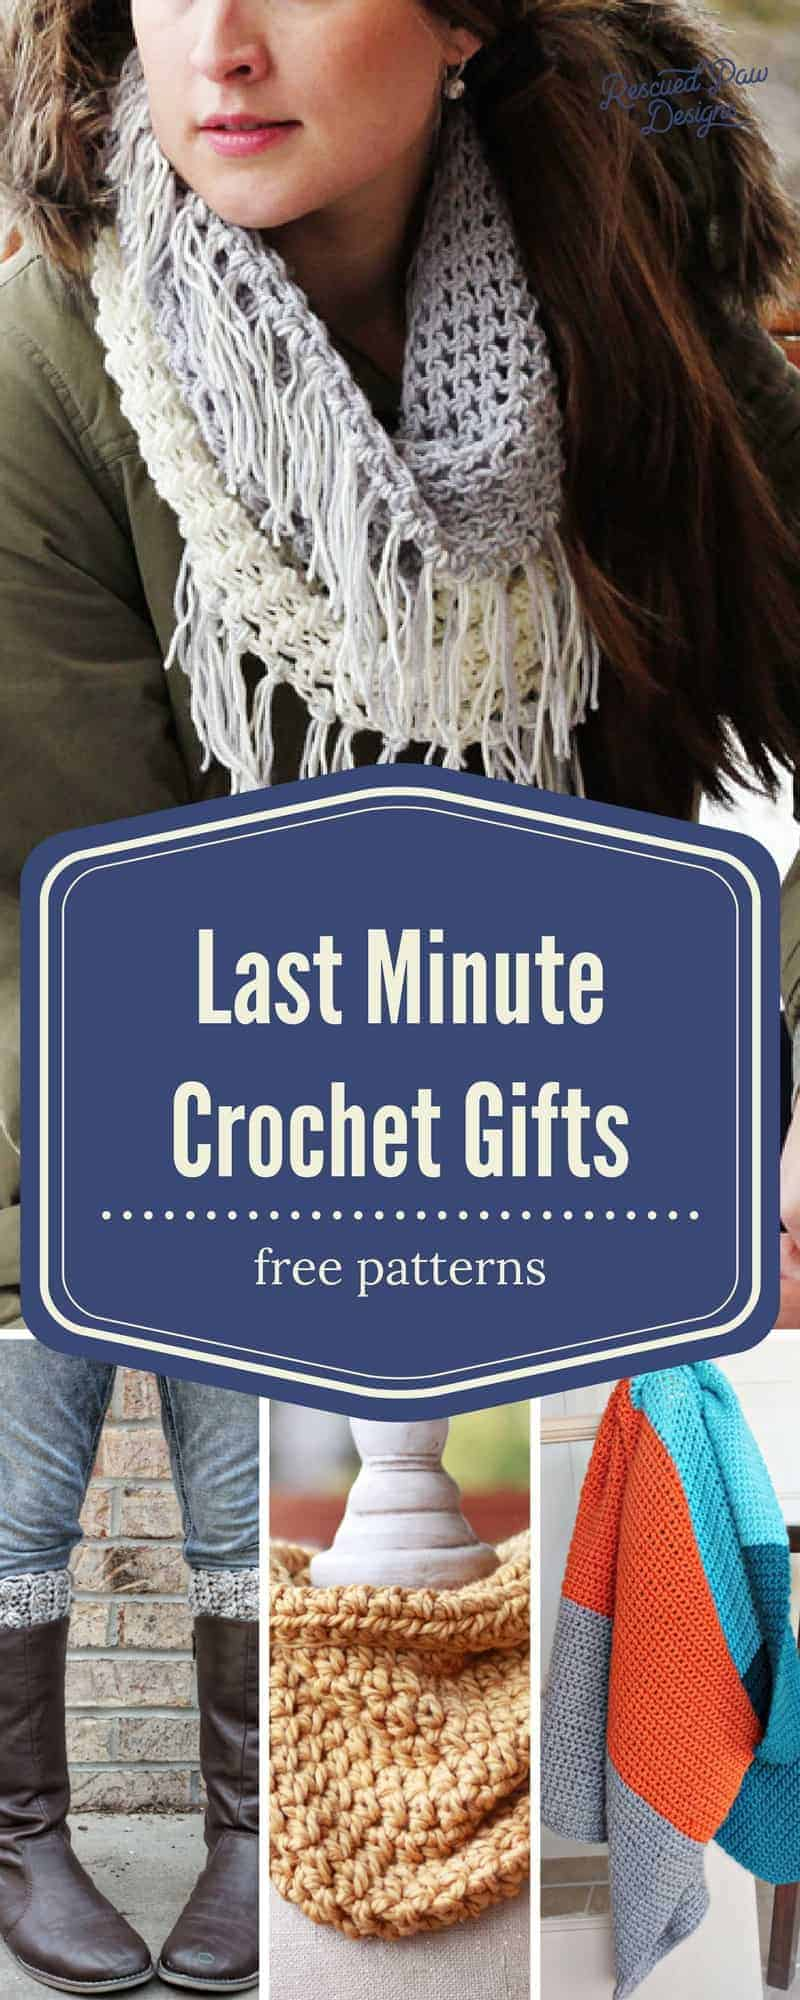 Last Minute Crochet Gifts- Make Last Minute Crochet Christmas Gifts in a Weekend! www.rescuedpawdesigns.com